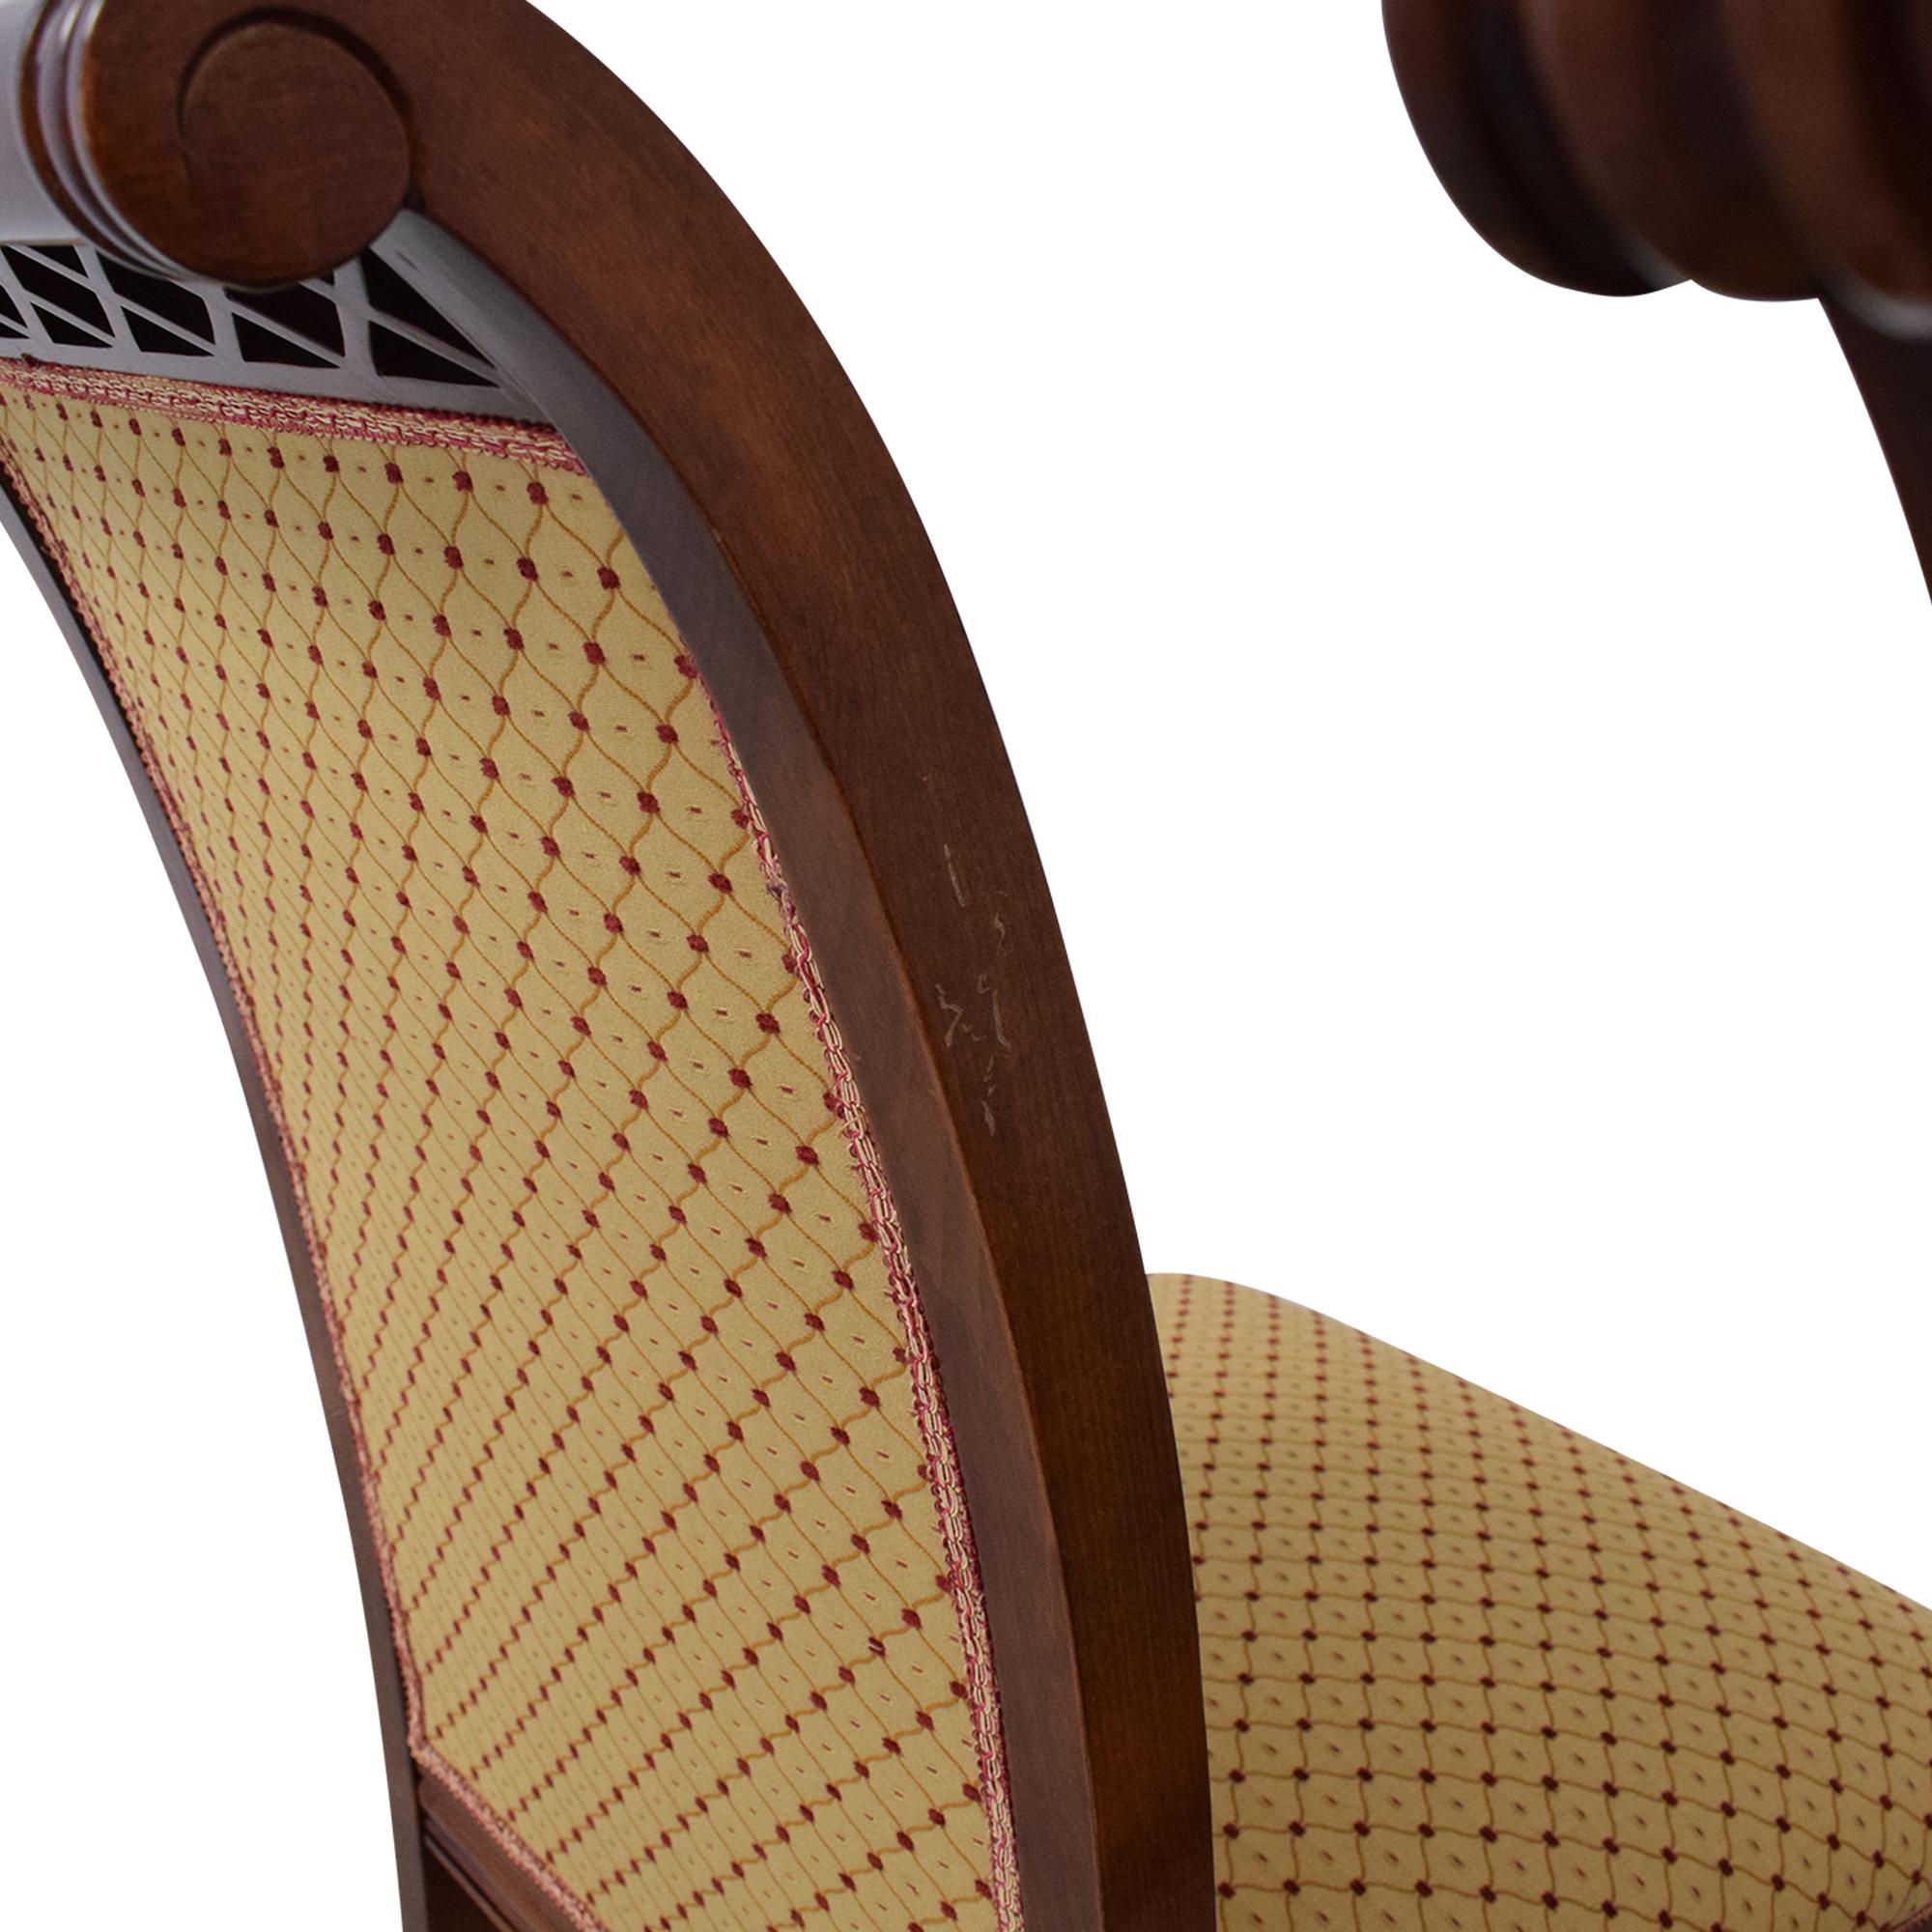 KPS Furnishings KPS Furnishings Custom Dining Chairs price